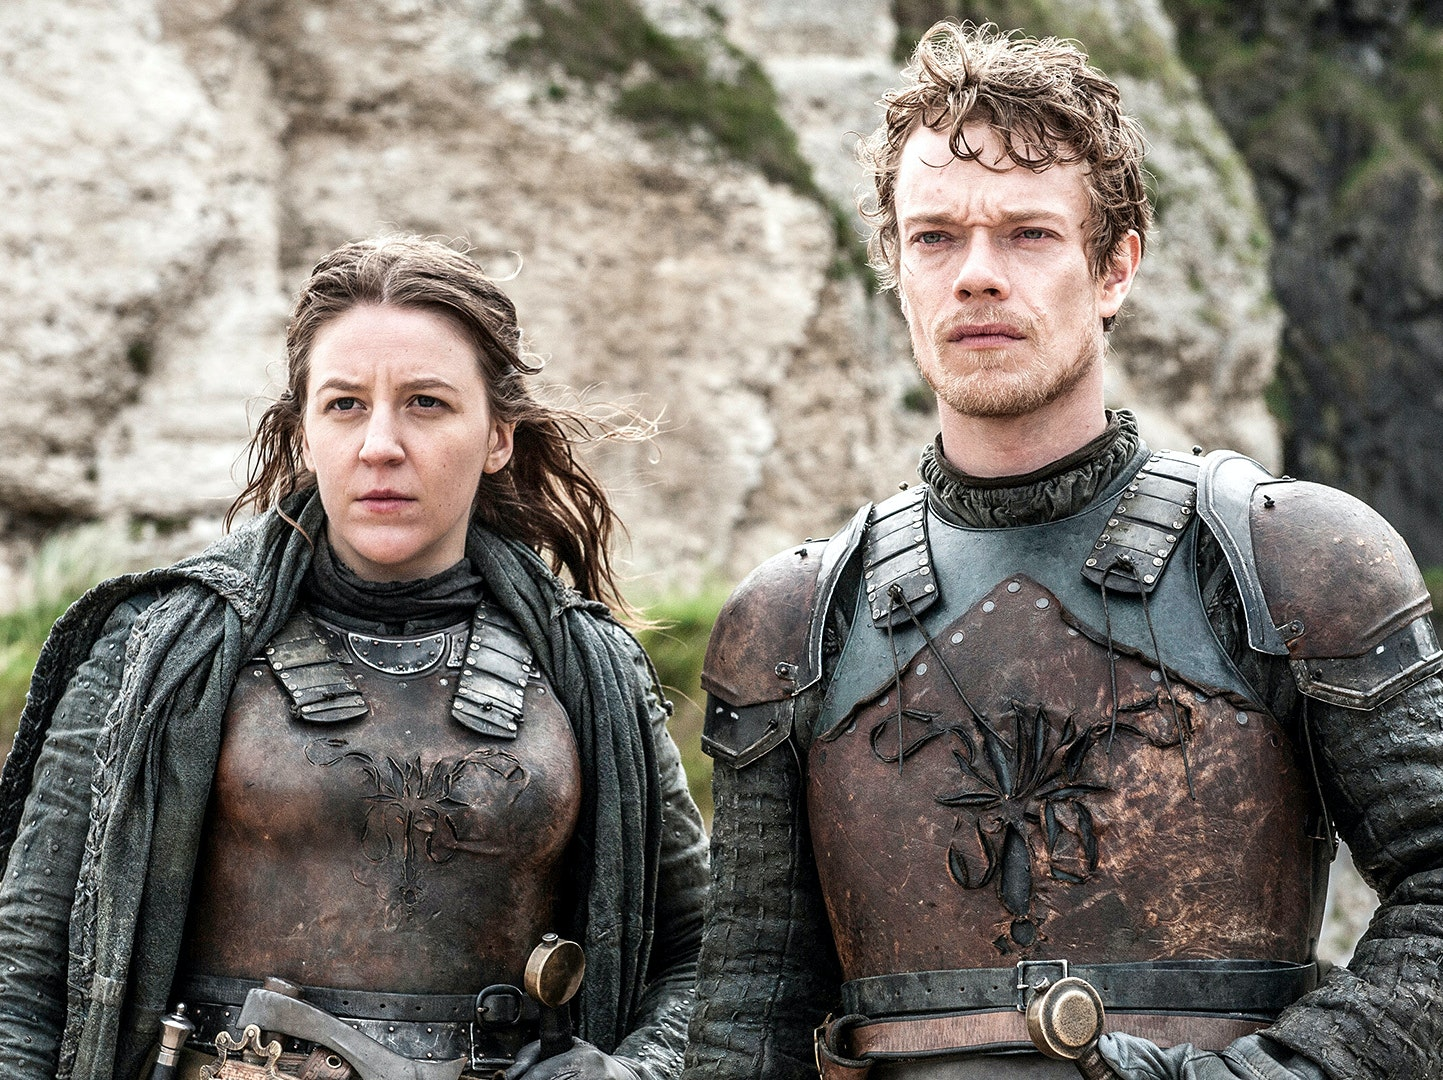 Conor McGregor Will Dick Around with Euron Greyjoy on 'GoT'